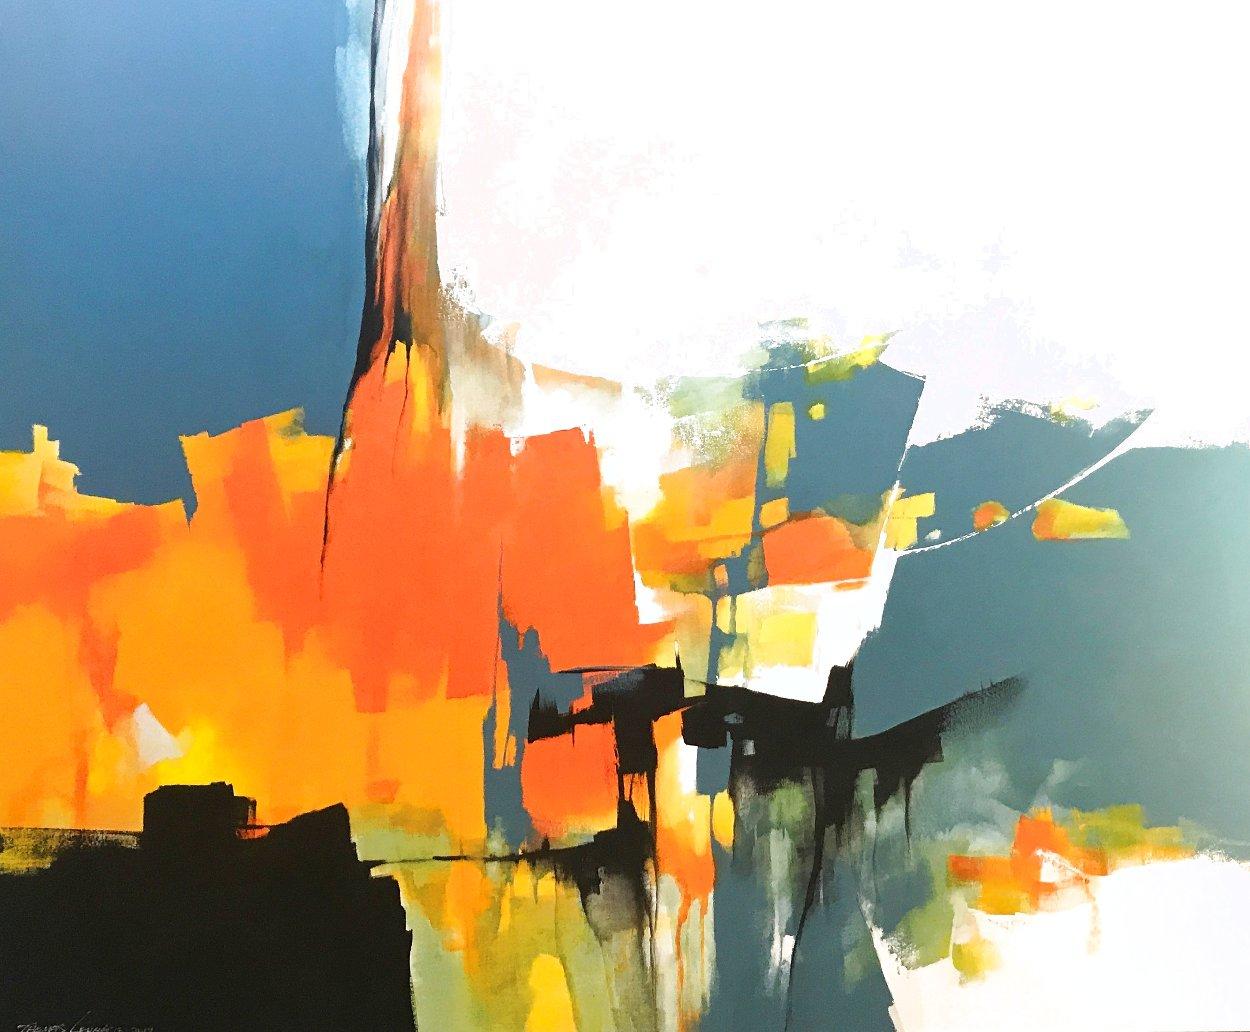 Expanse 2019 59x70 Huge Original Painting by Thomas Leung